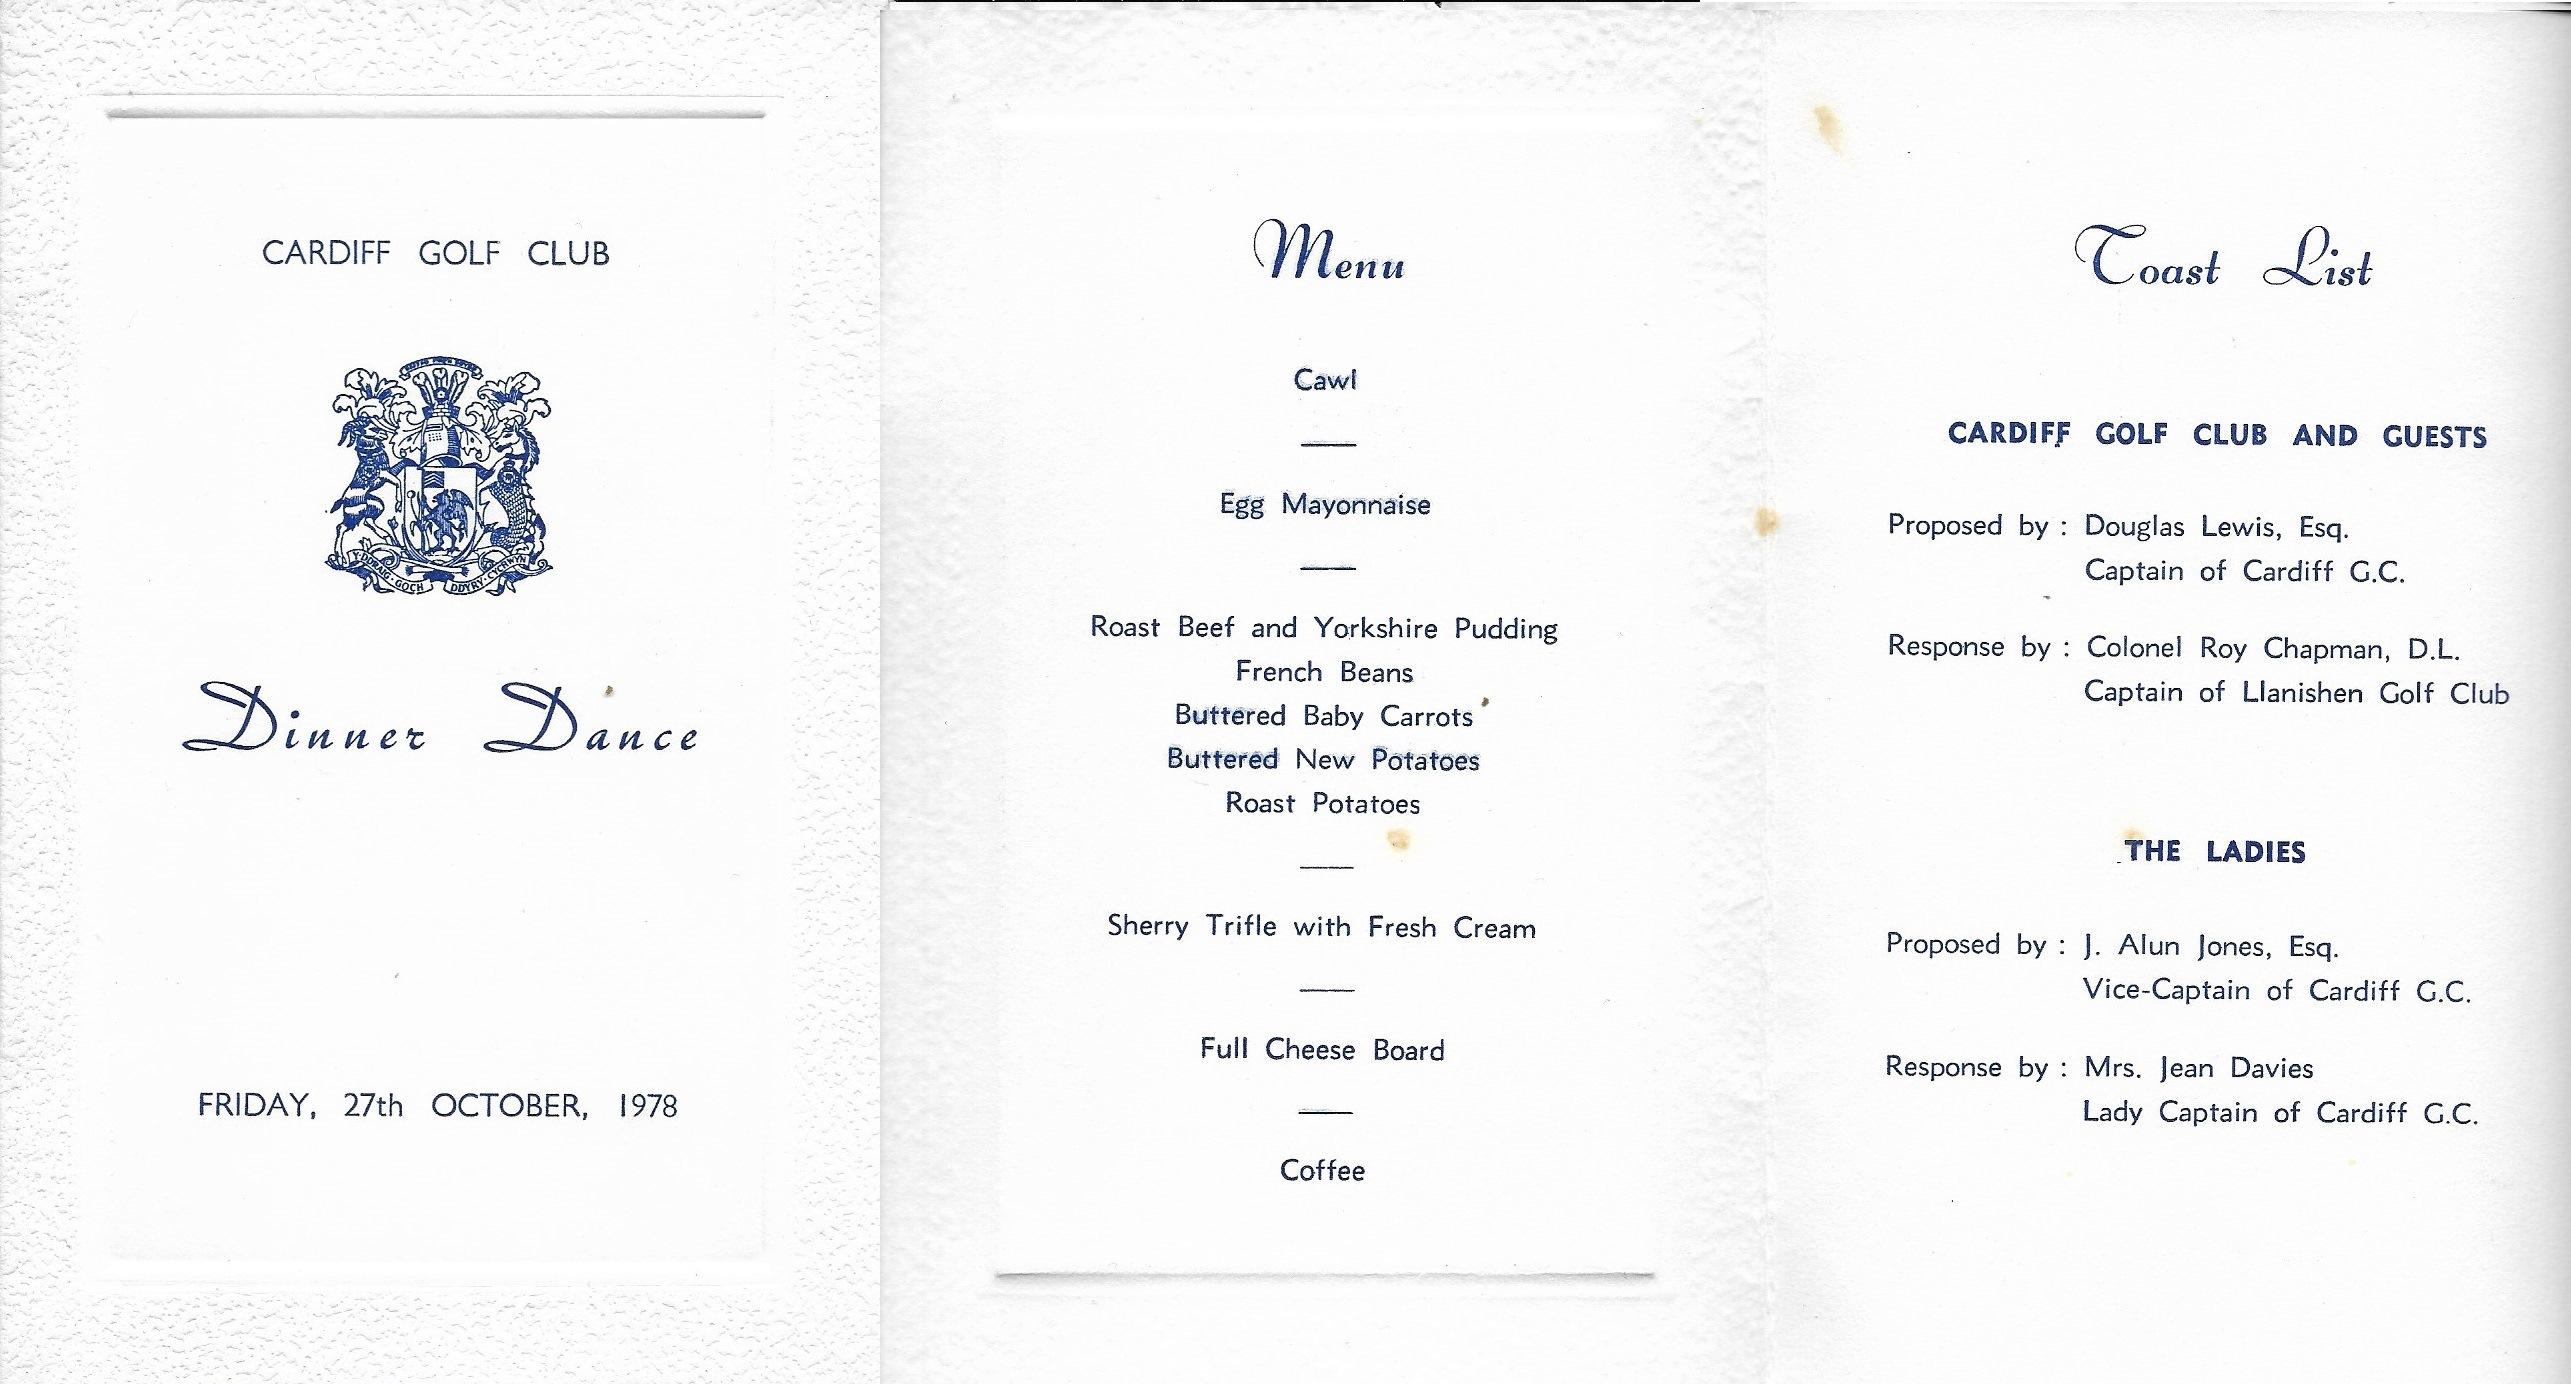 Annual Dinner Dance 1978